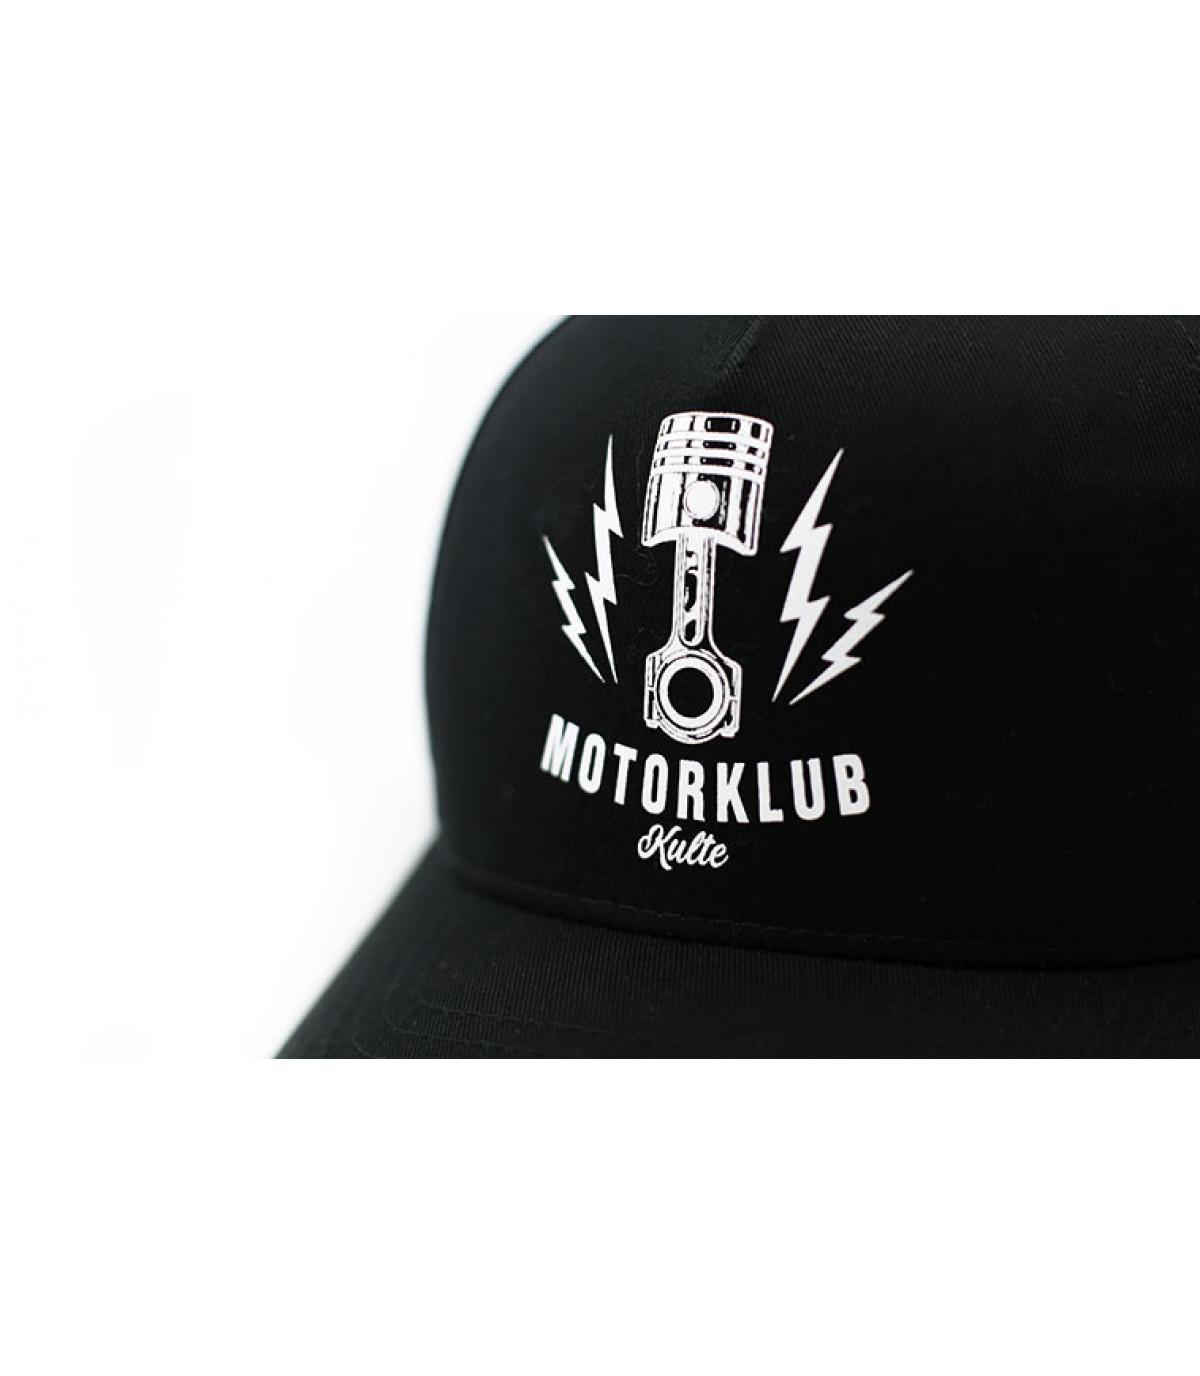 Detalles Motorklub black imagen 3